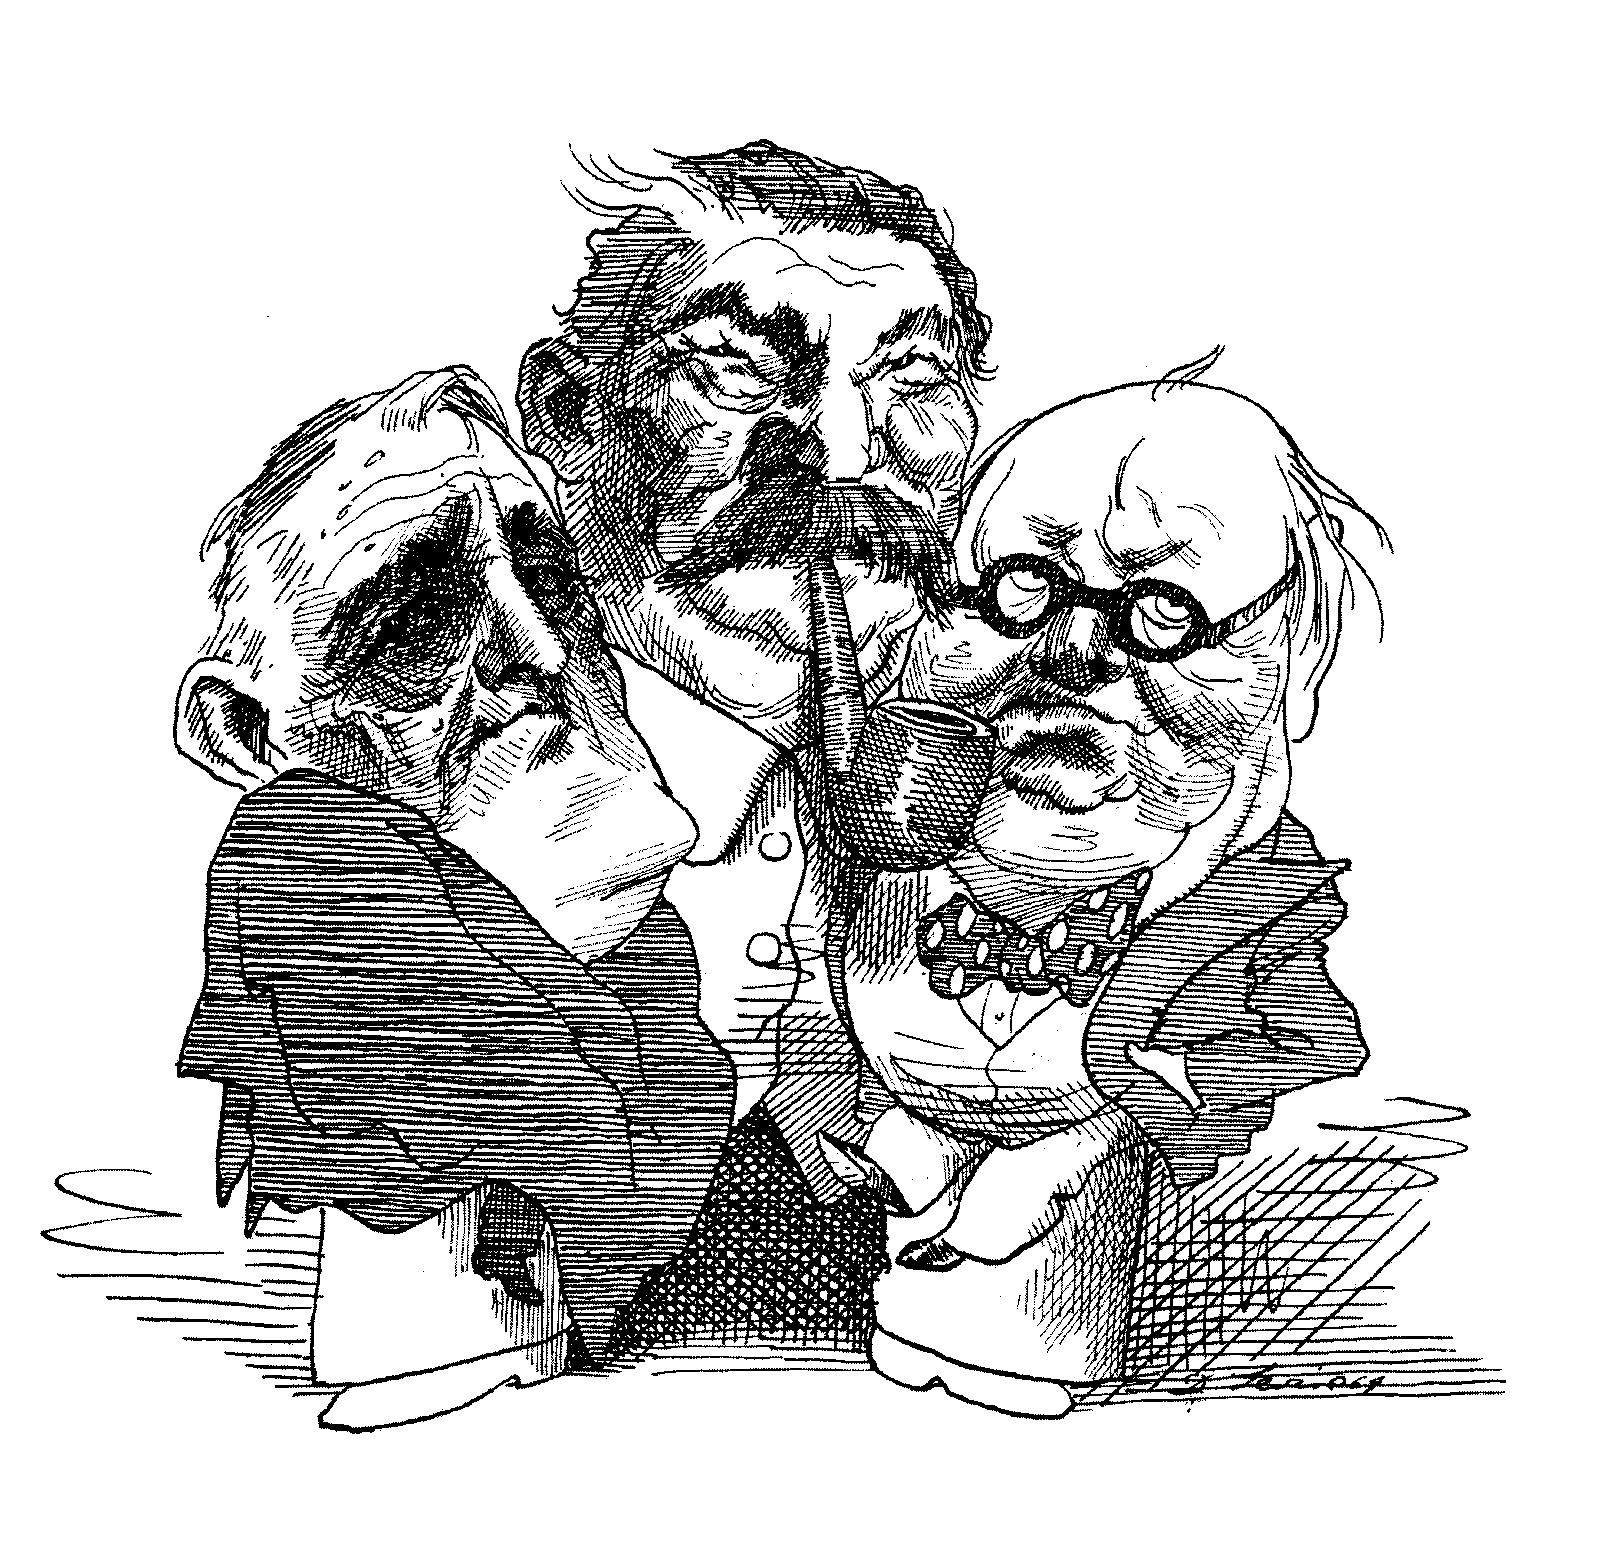 Roosevelt, Stalin and Churchill